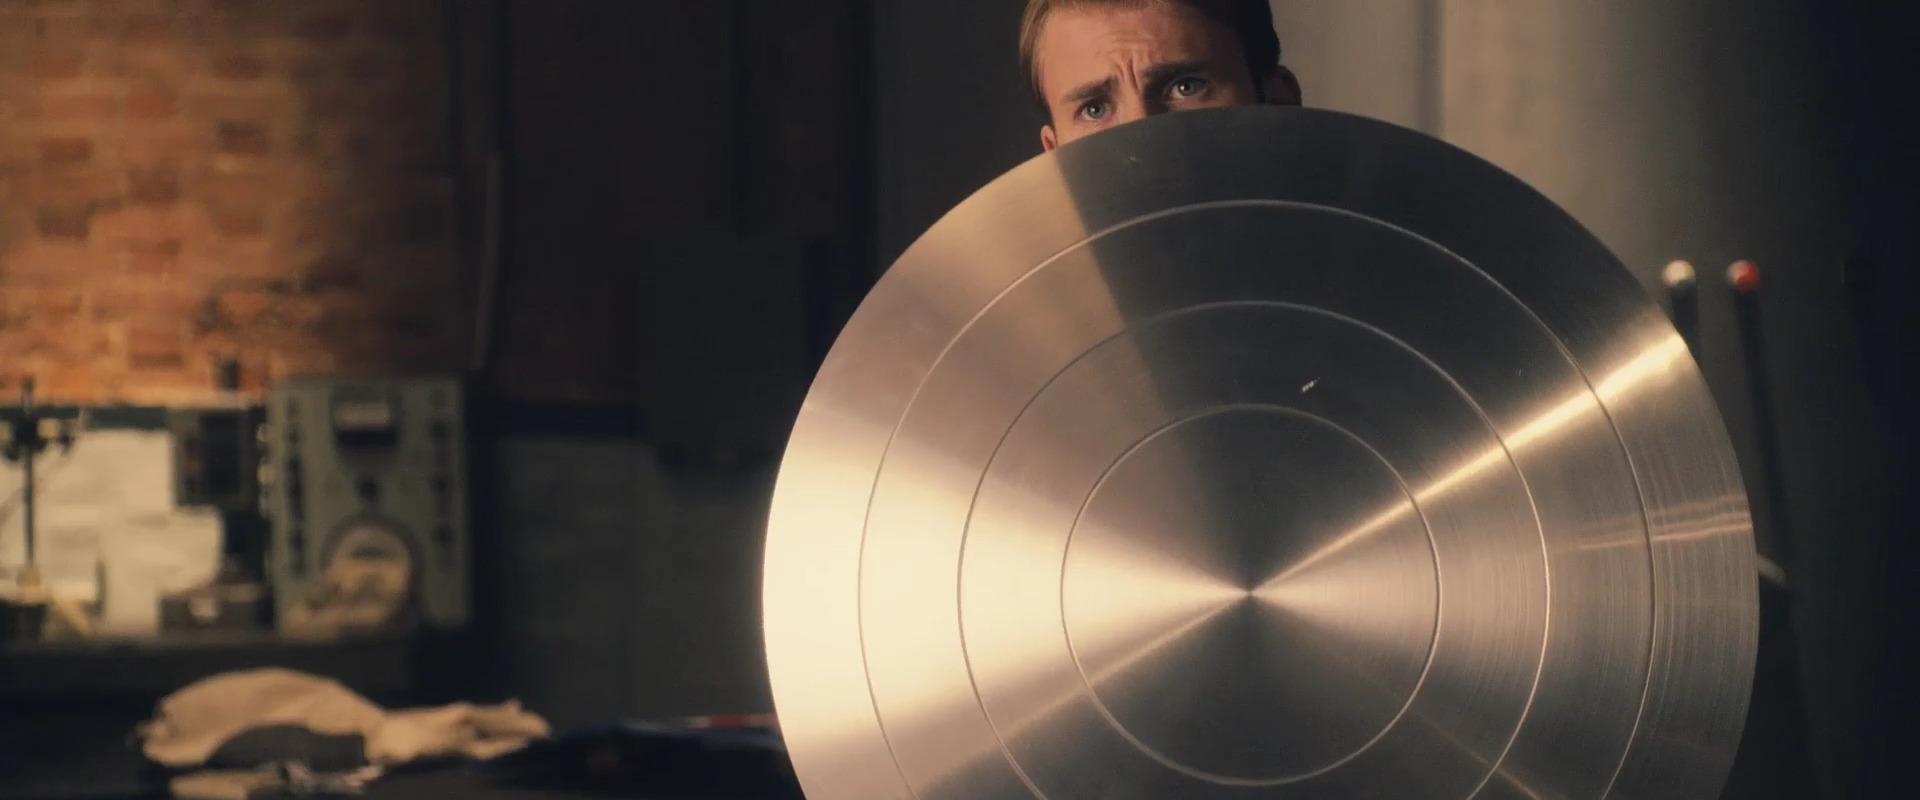 Captain America Trailer Screencaps The First Avenger